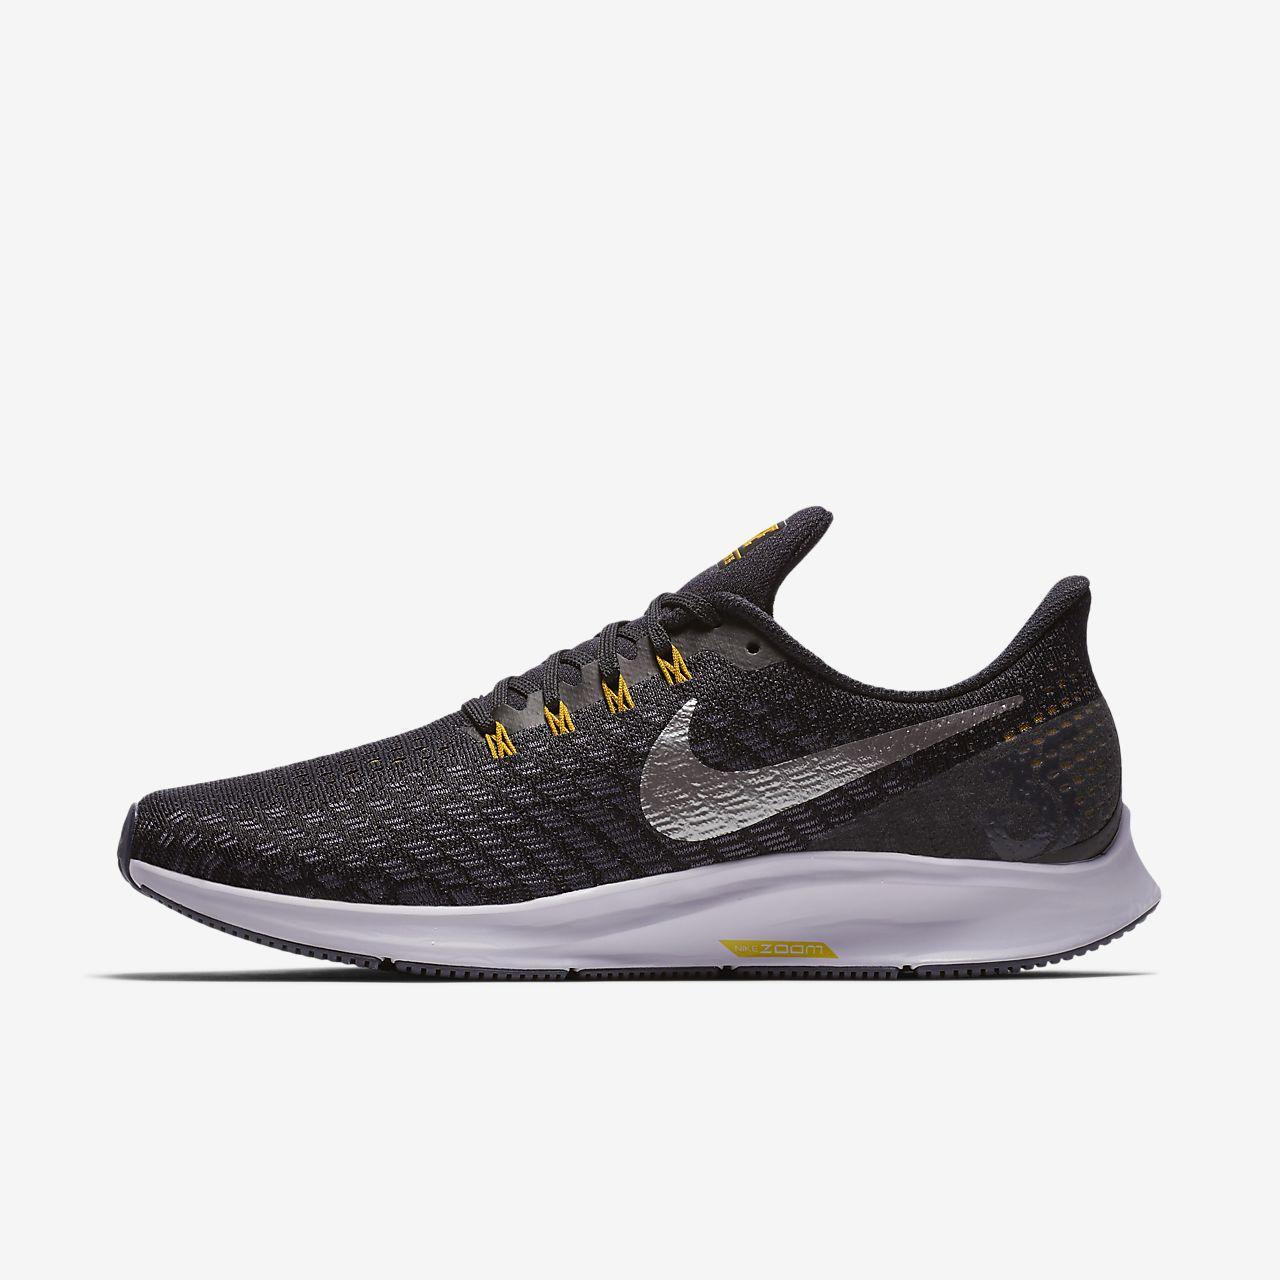 6cdeeb5bed39 Nike Air Zoom Pegasus 35 Men s Running Shoe. Nike.com MY